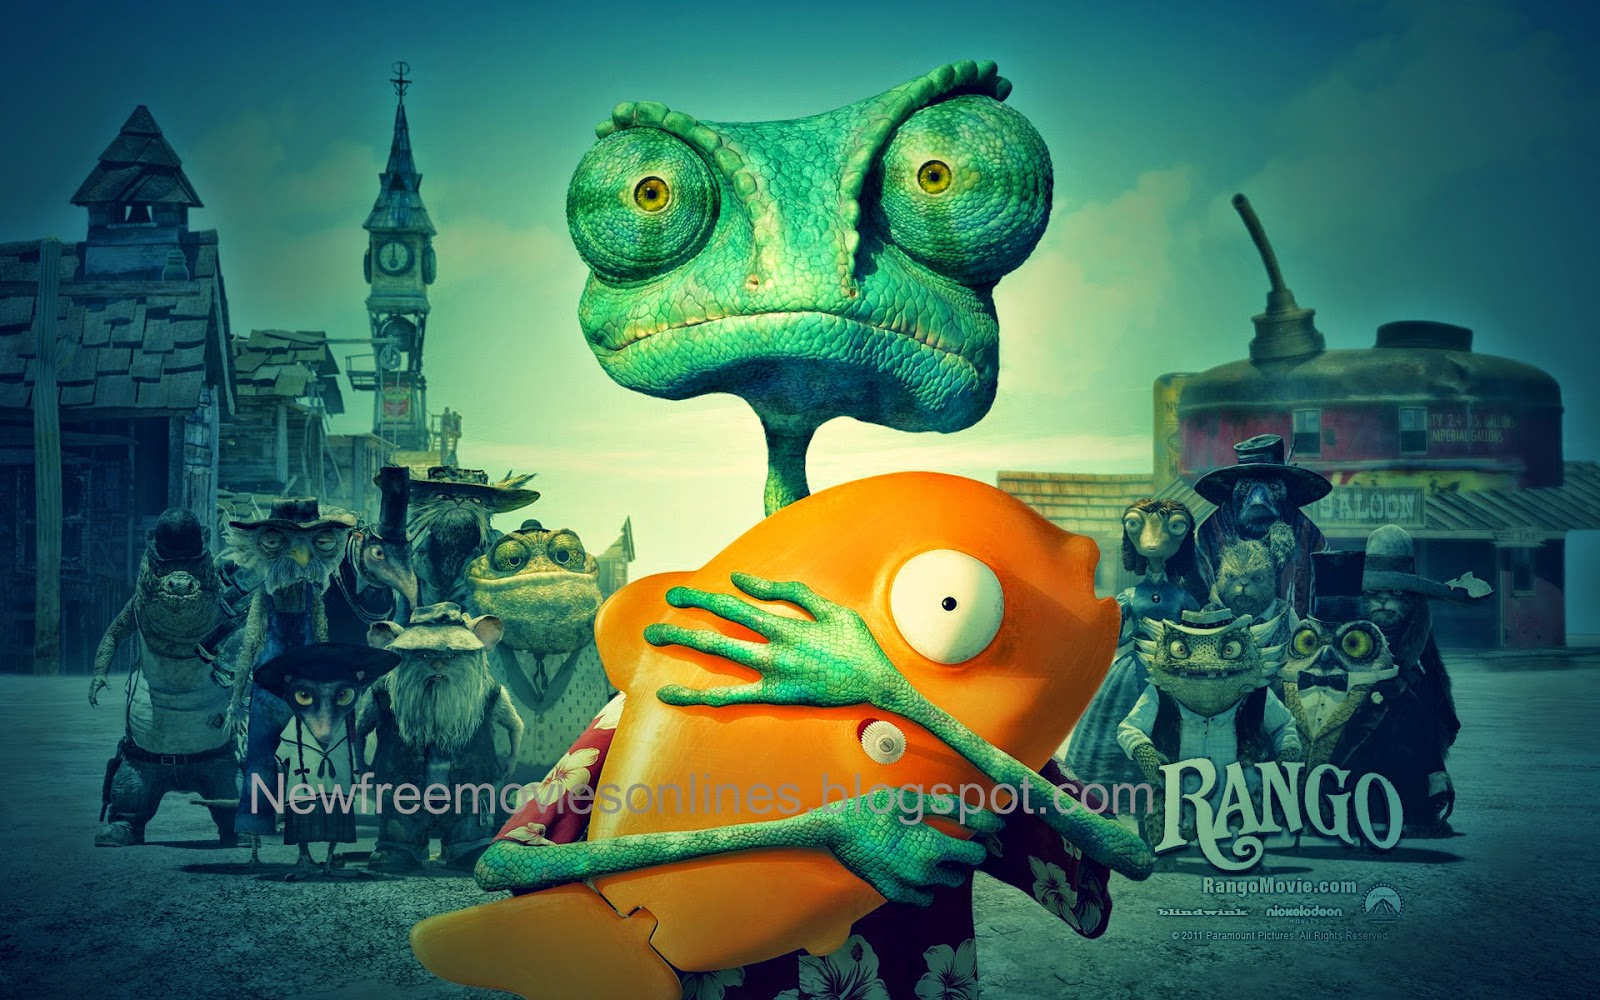 Mobilemoviewala Rango 2011 Full Hd Movie In English Watch Online Free